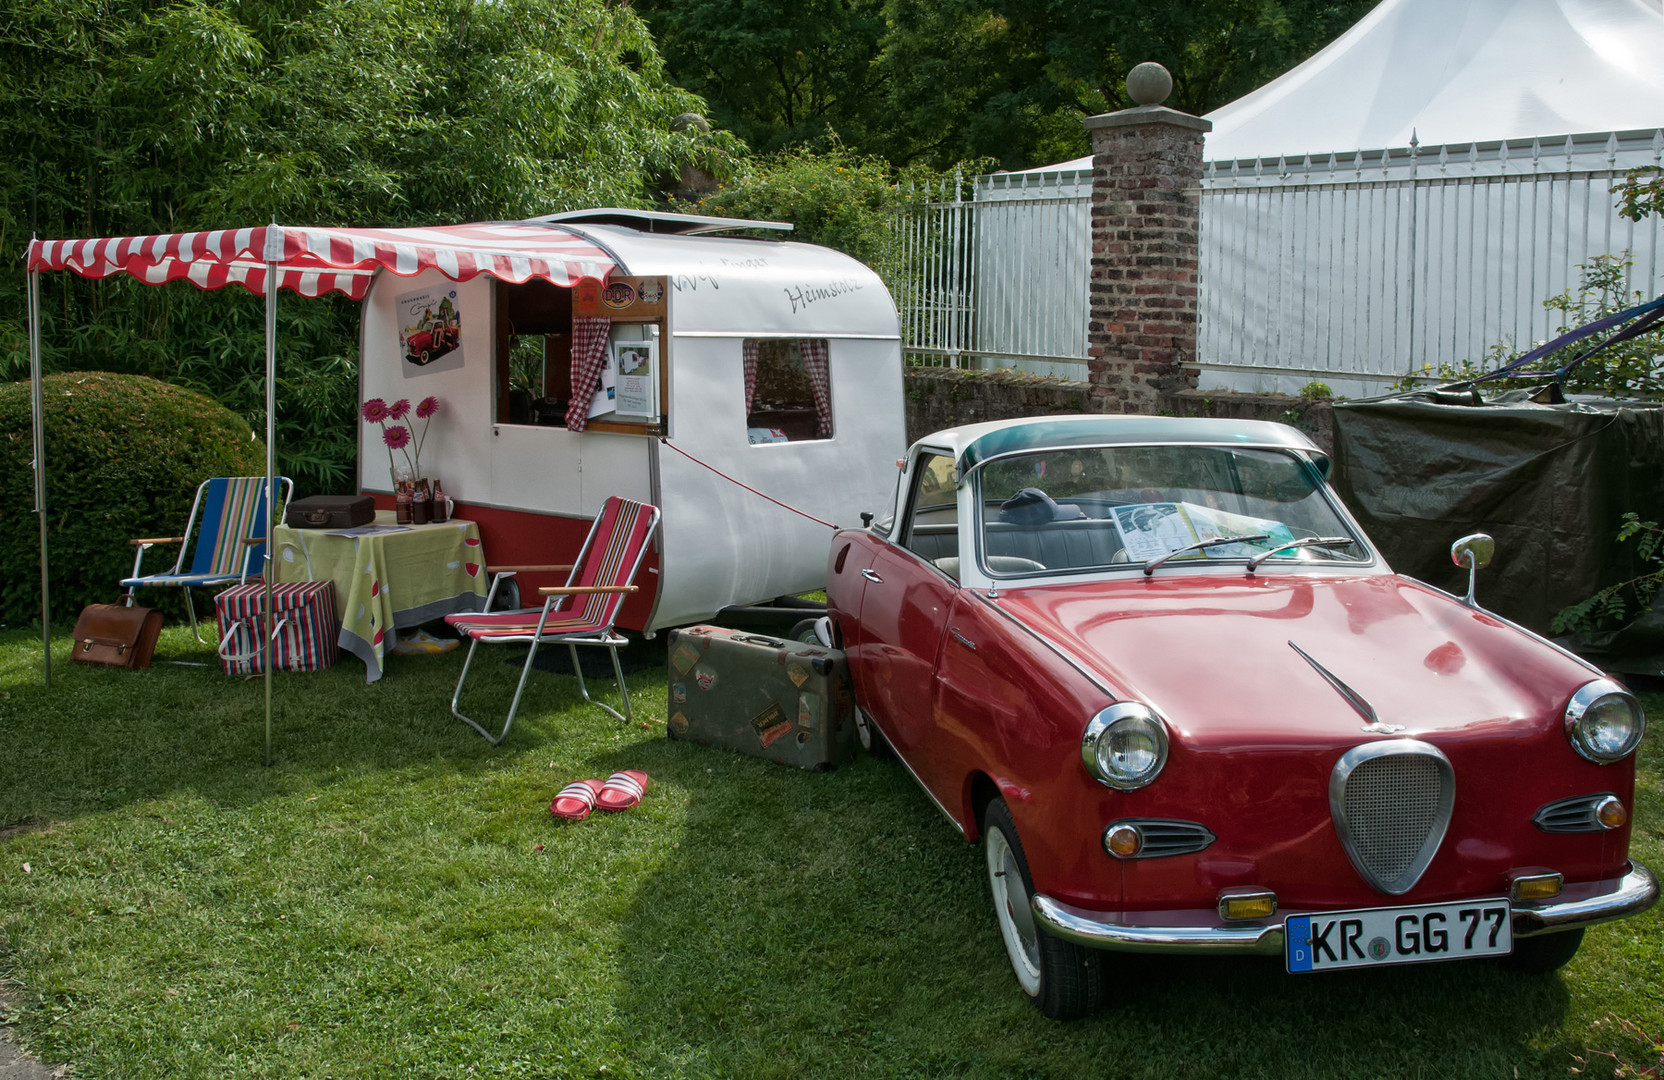 Camping - Wie Dazumal